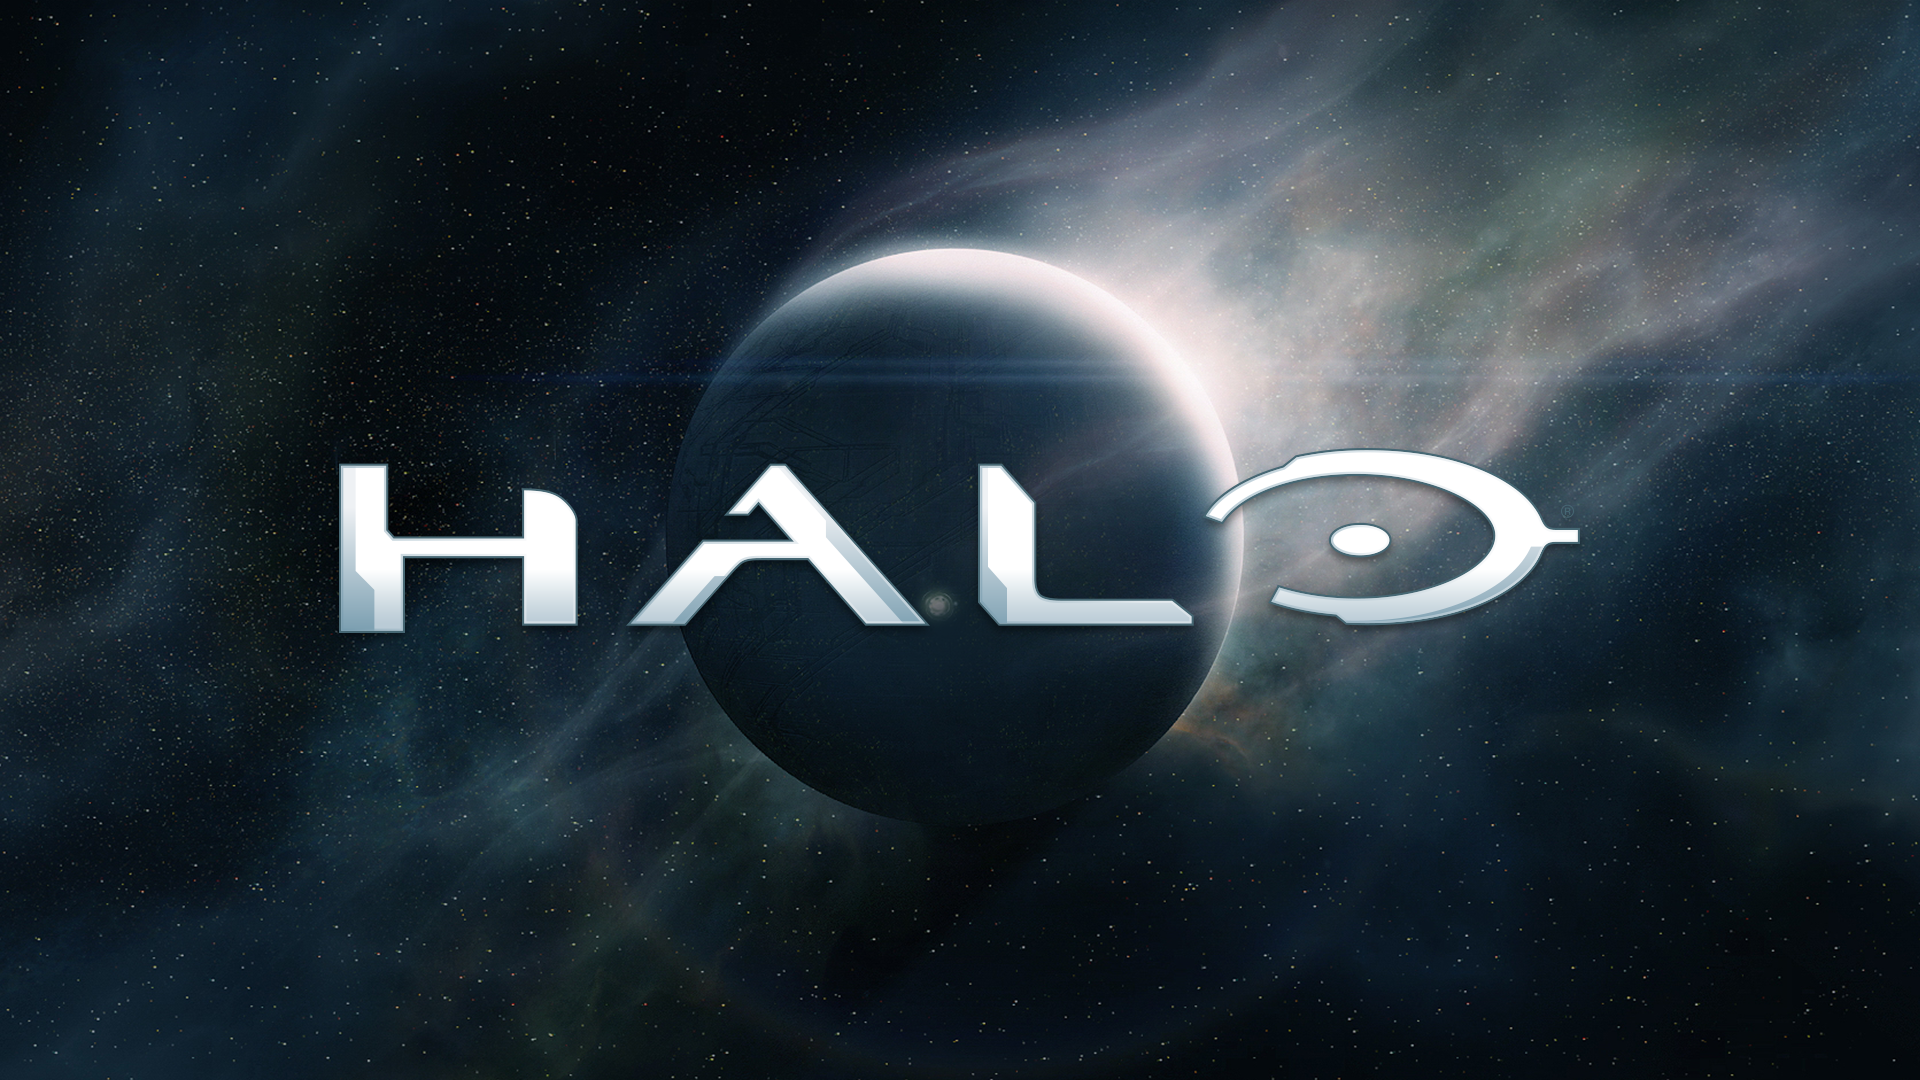 Съёмки сериала Halo стартуют ссамого начала будущего 2019 года